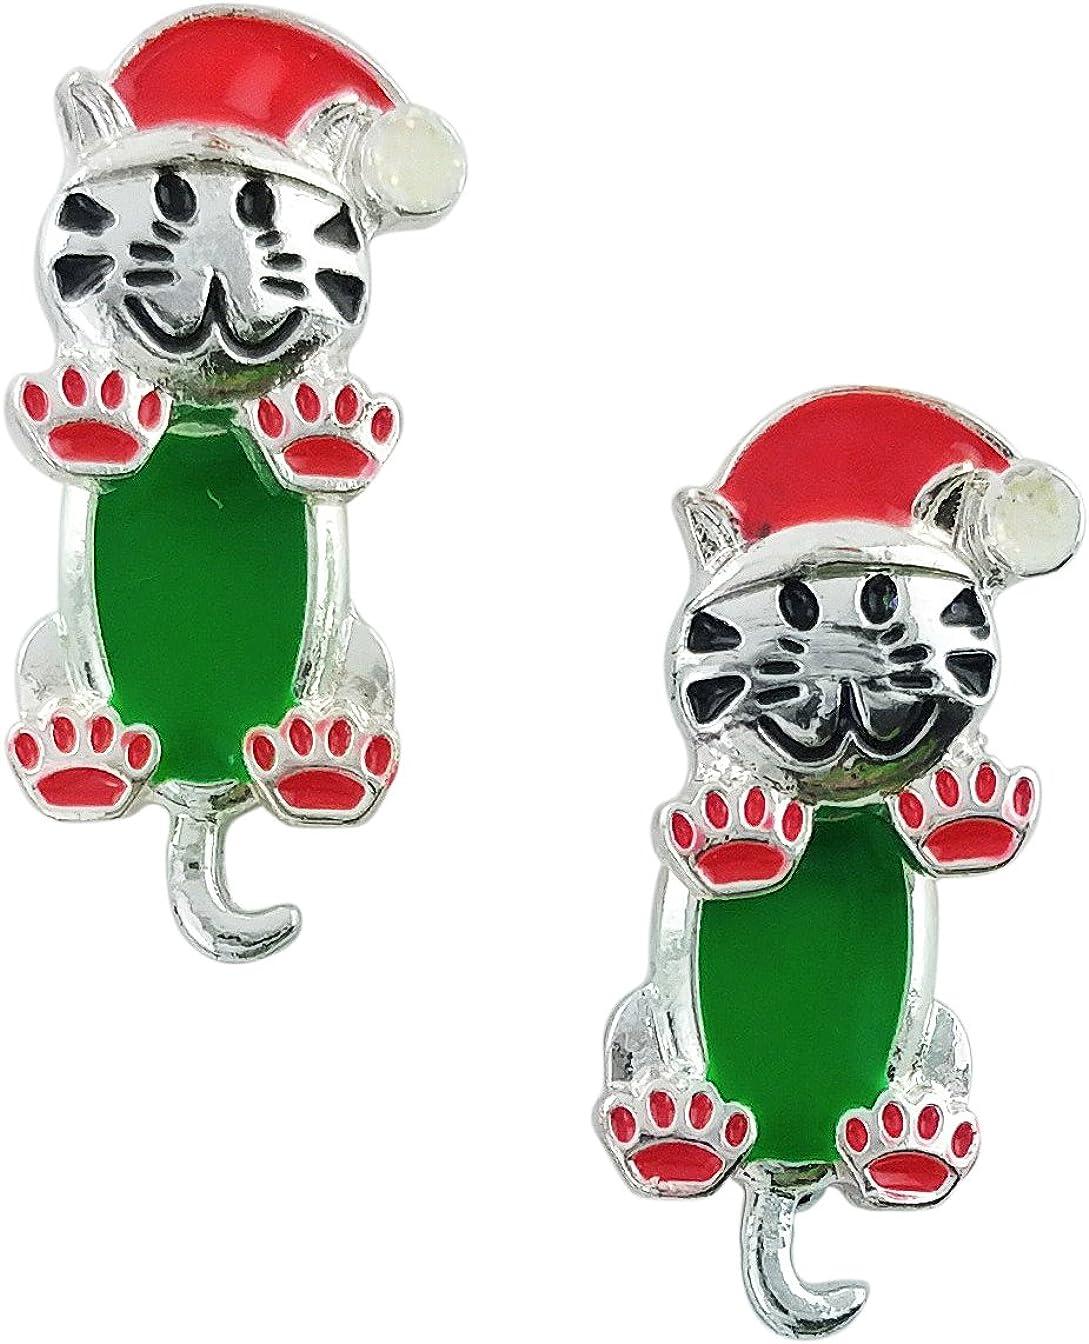 Rectangular Christmas Dear Santa I Want It All Royal Lion Cufflinks